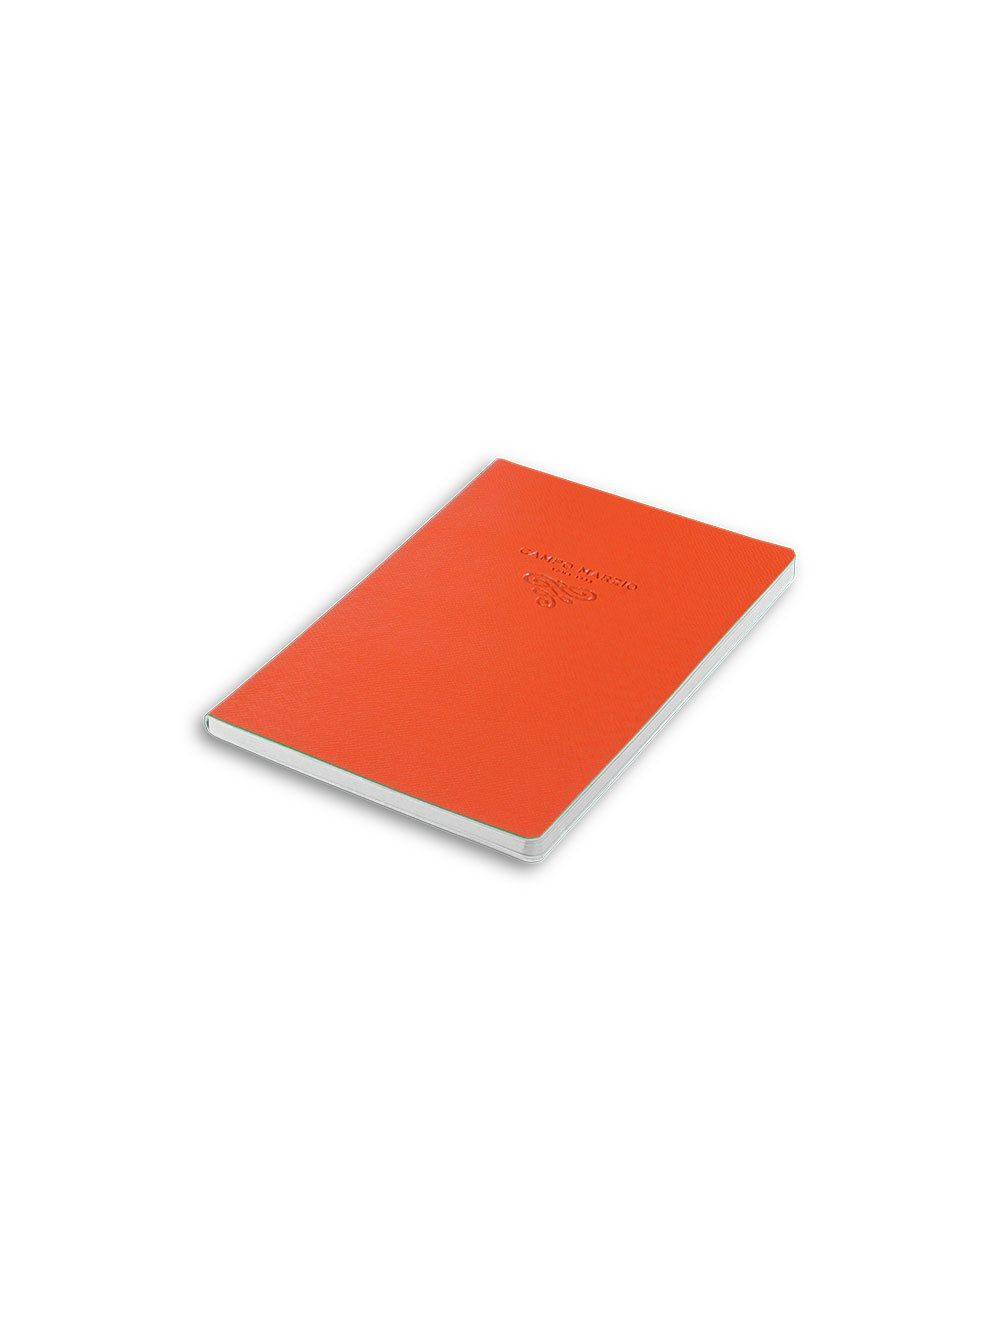 Journal 16,5 X 23,4 Cm - White Internal Paper - Mandarin